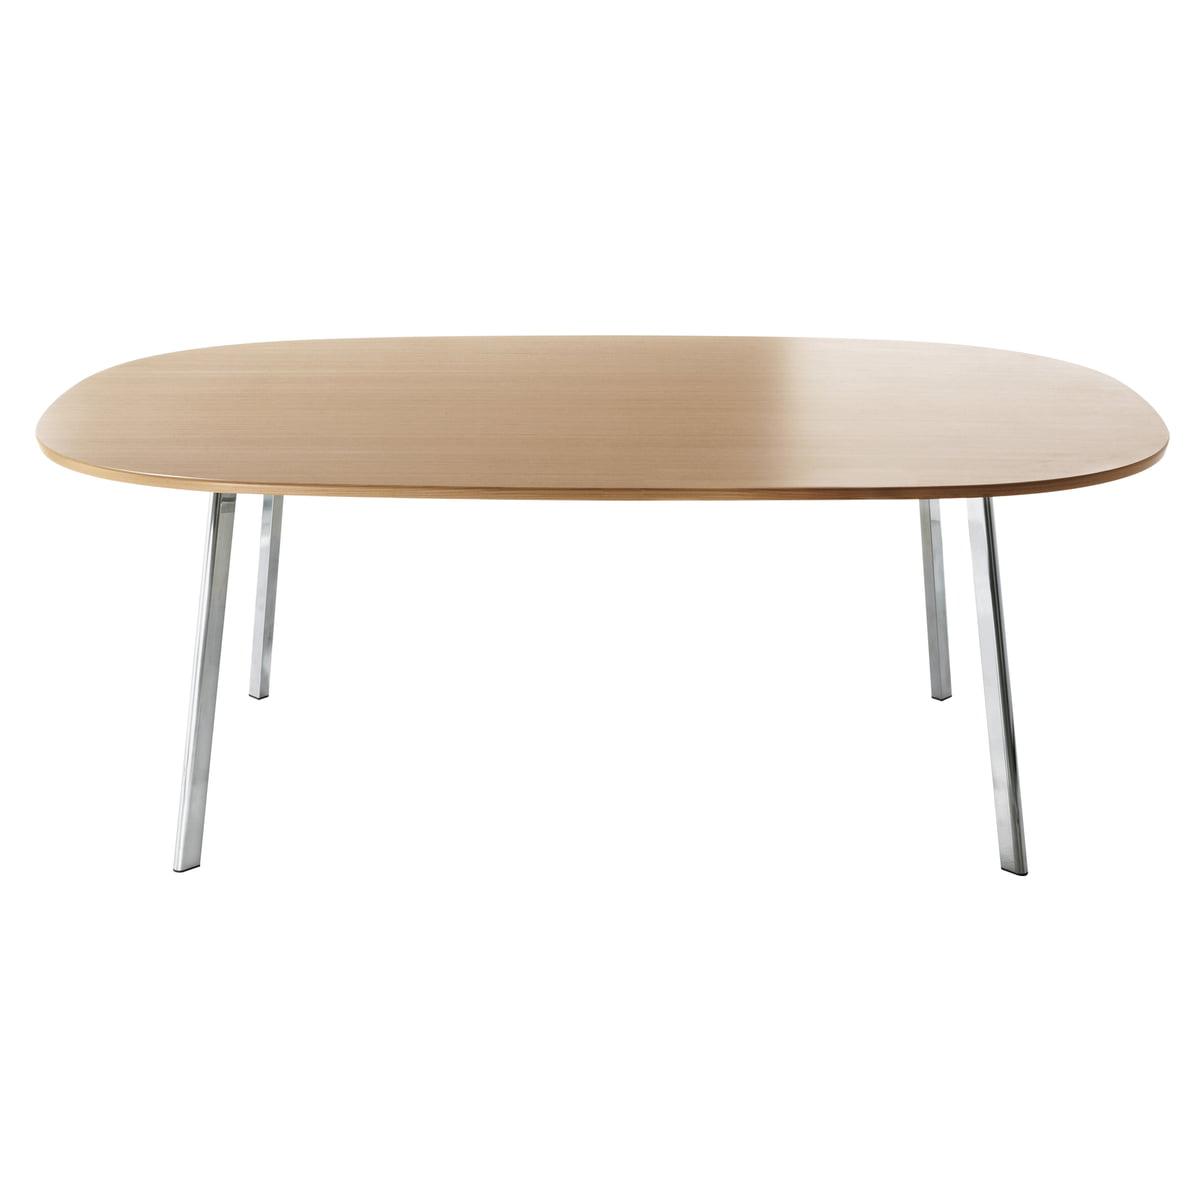 Magis   Déjà Vu Table, 160 X 98 Cm, Veneered Oak Wood